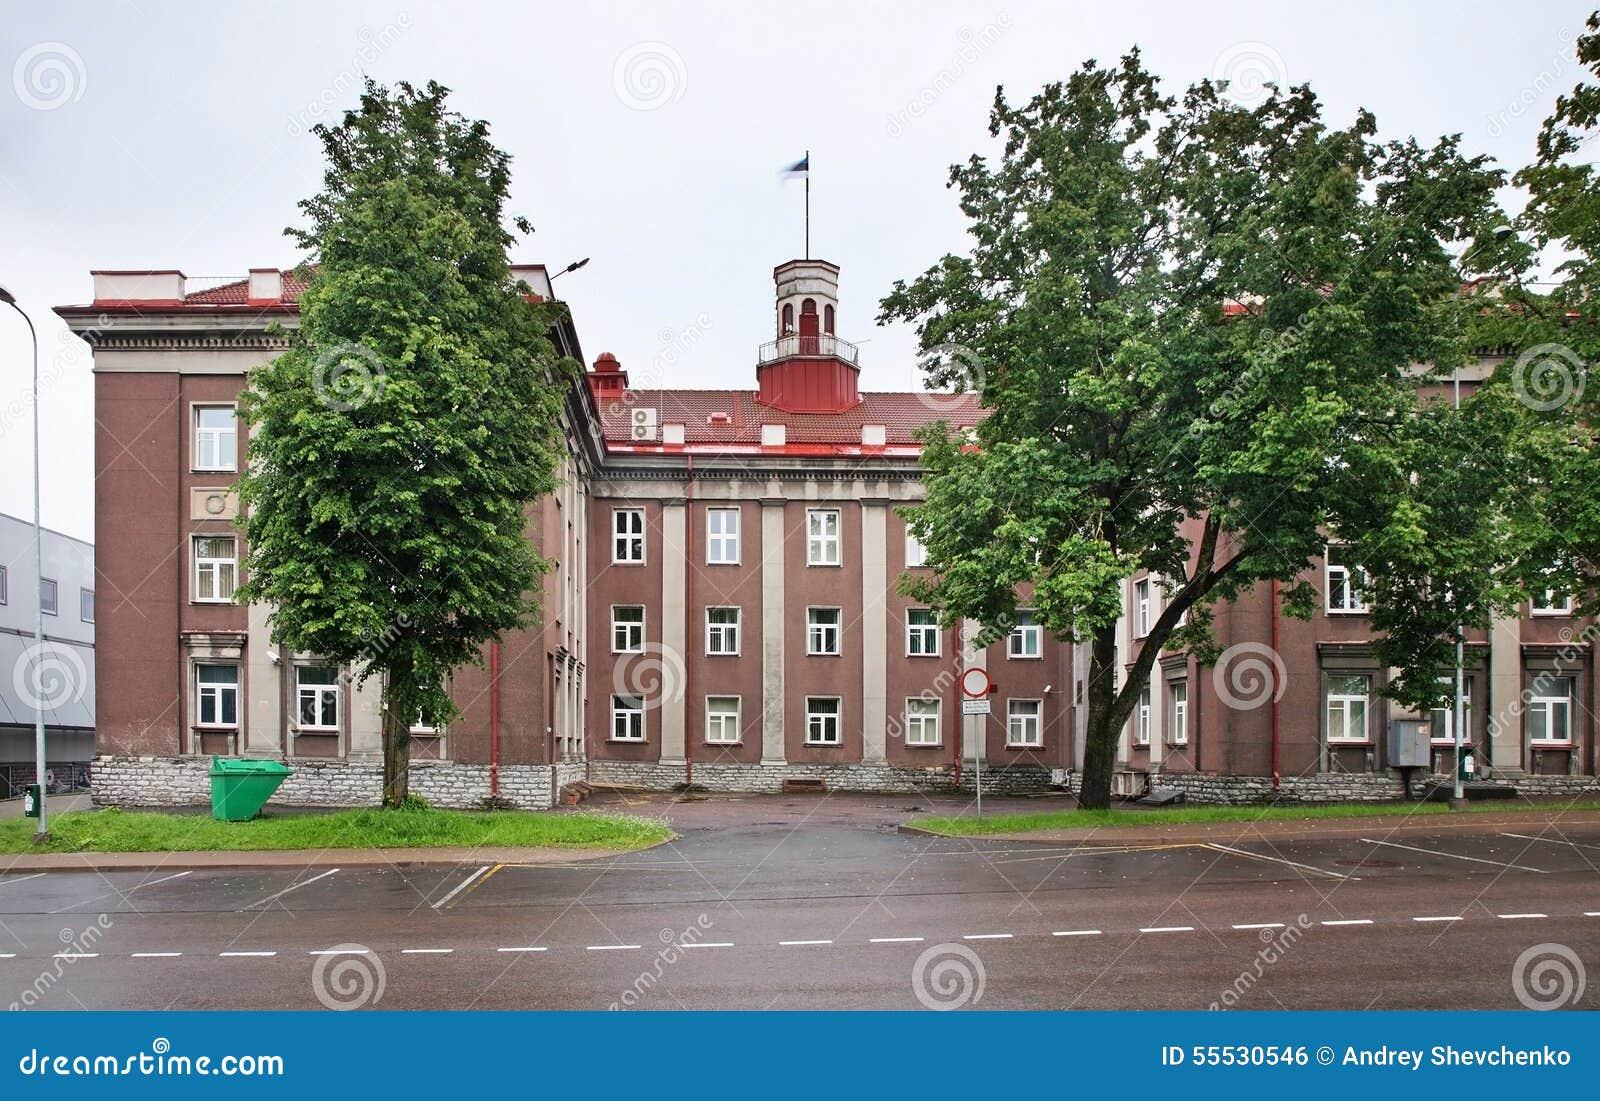 Town Hall In Johvi Estonia Stock Photo Image 55530546